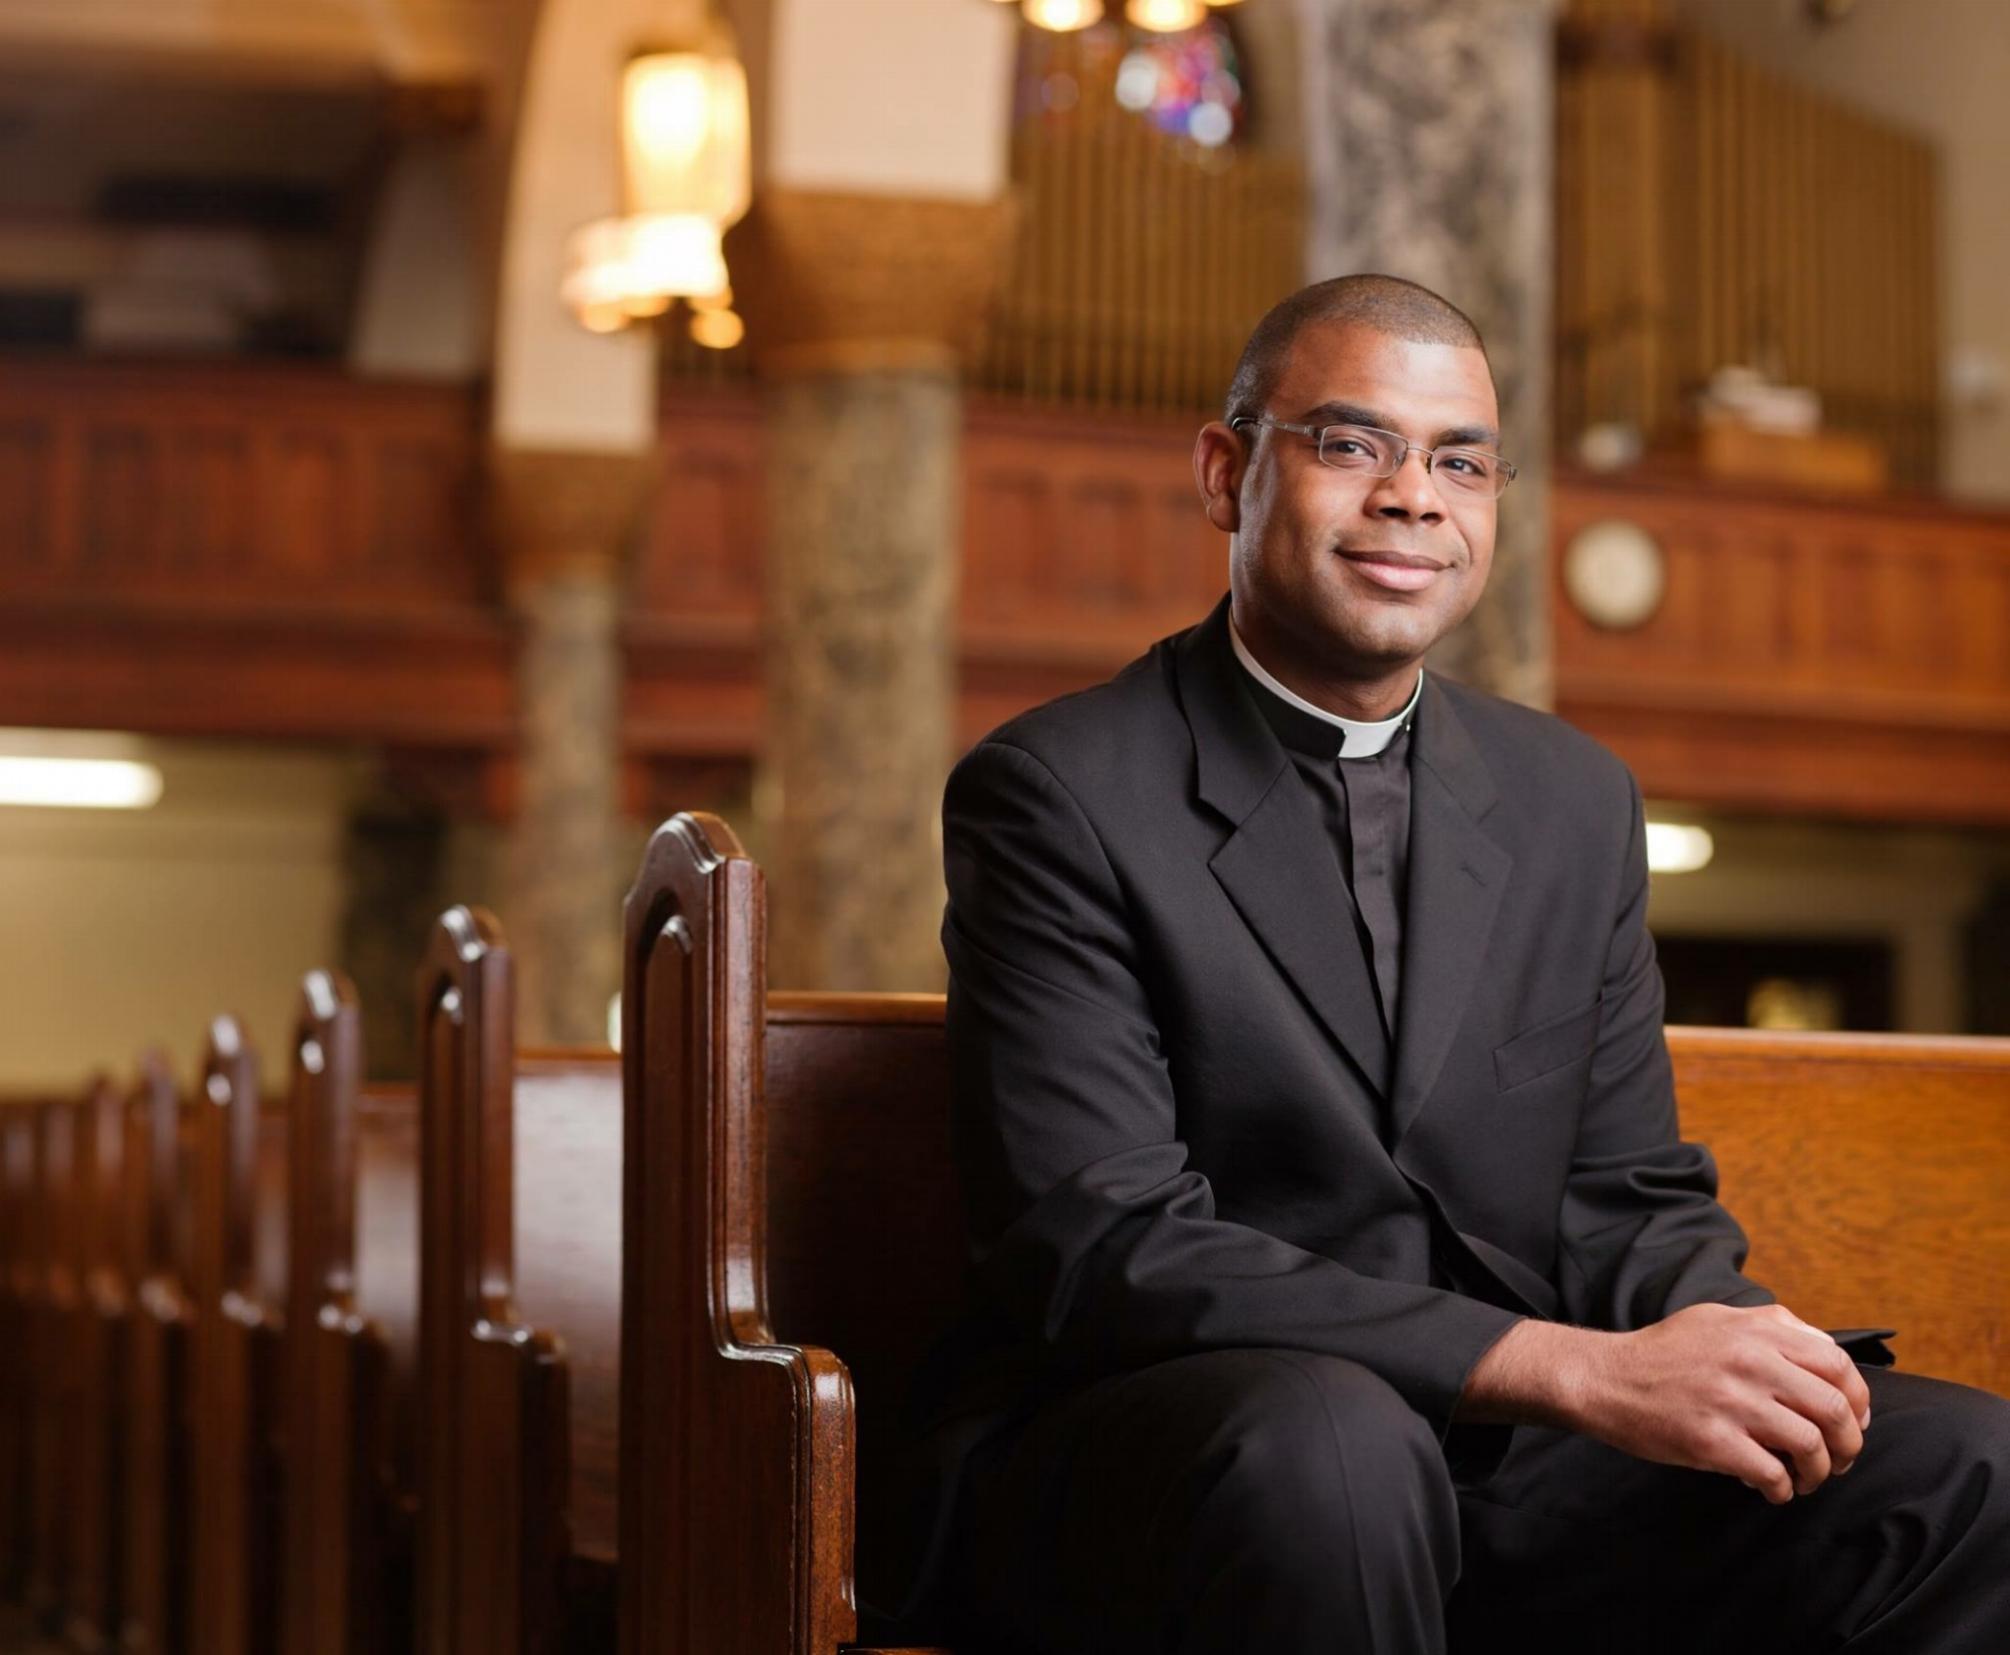 Father Alonzo Cox, Pastor